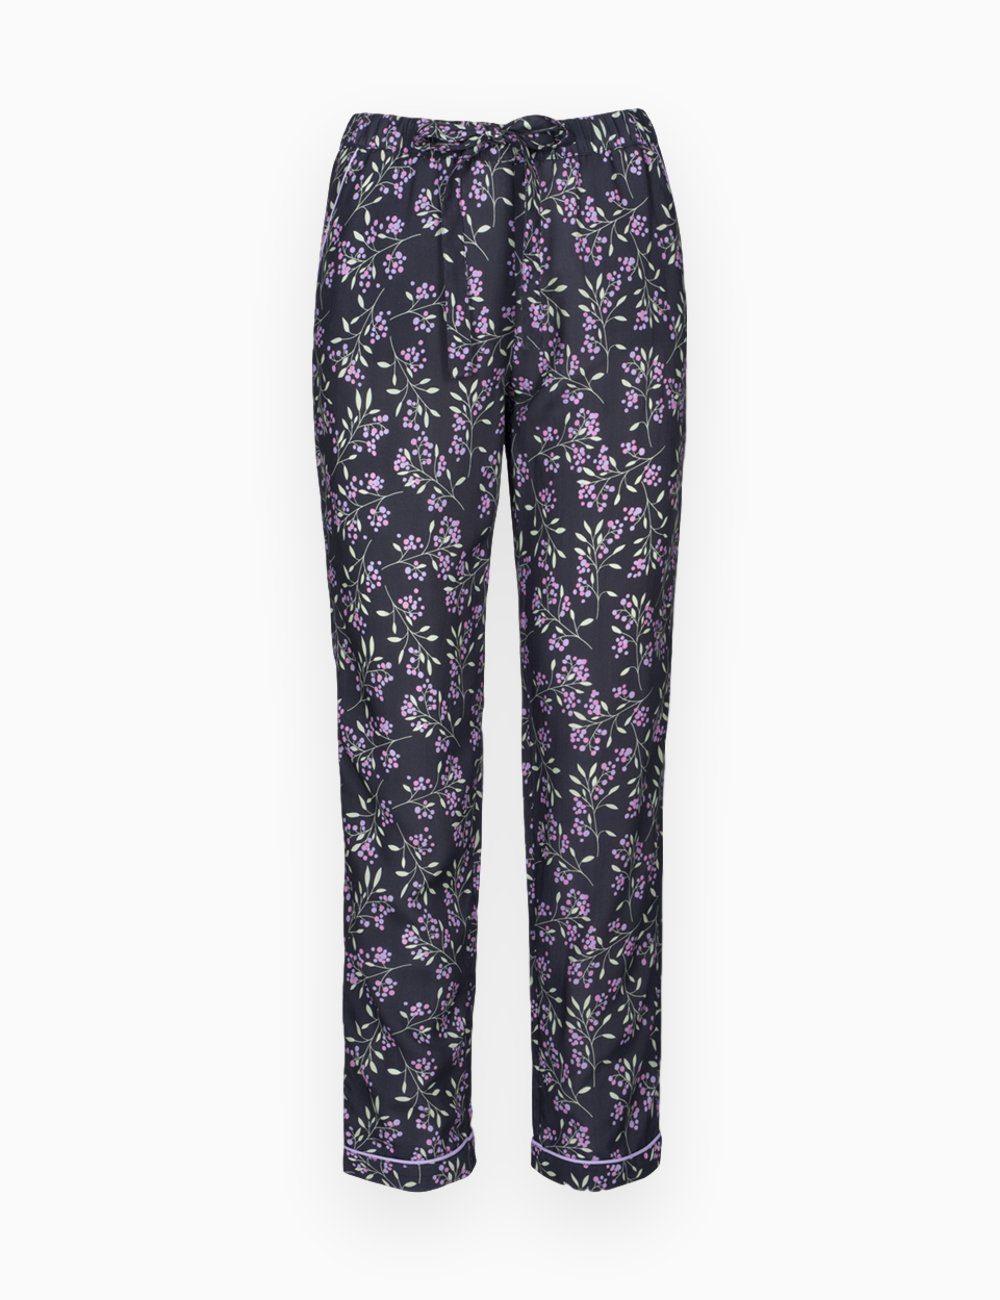 Pyjama Bottoms Funky Flowers